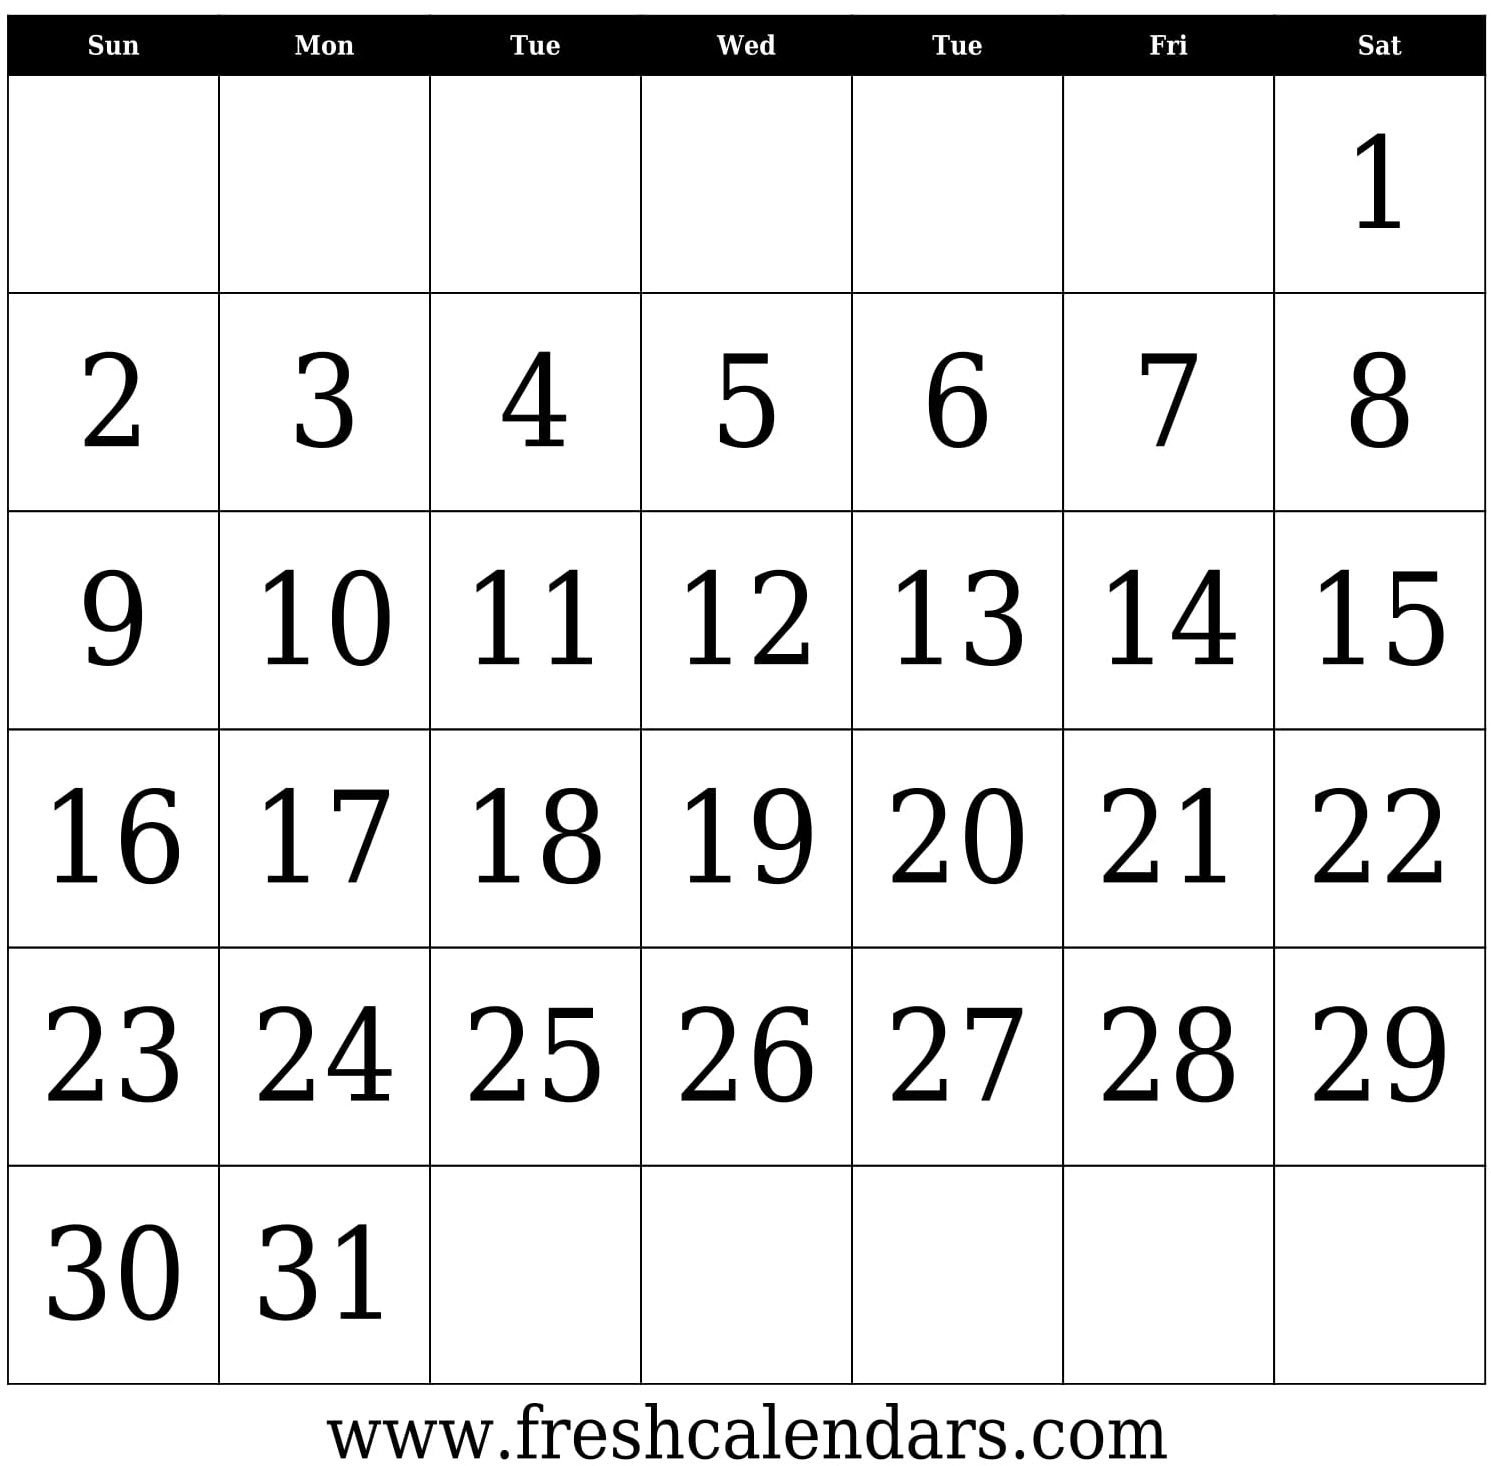 Printable Calendar Numbers 1-31 | Calendar Printables Free Calendar Numbers Printable 1-31